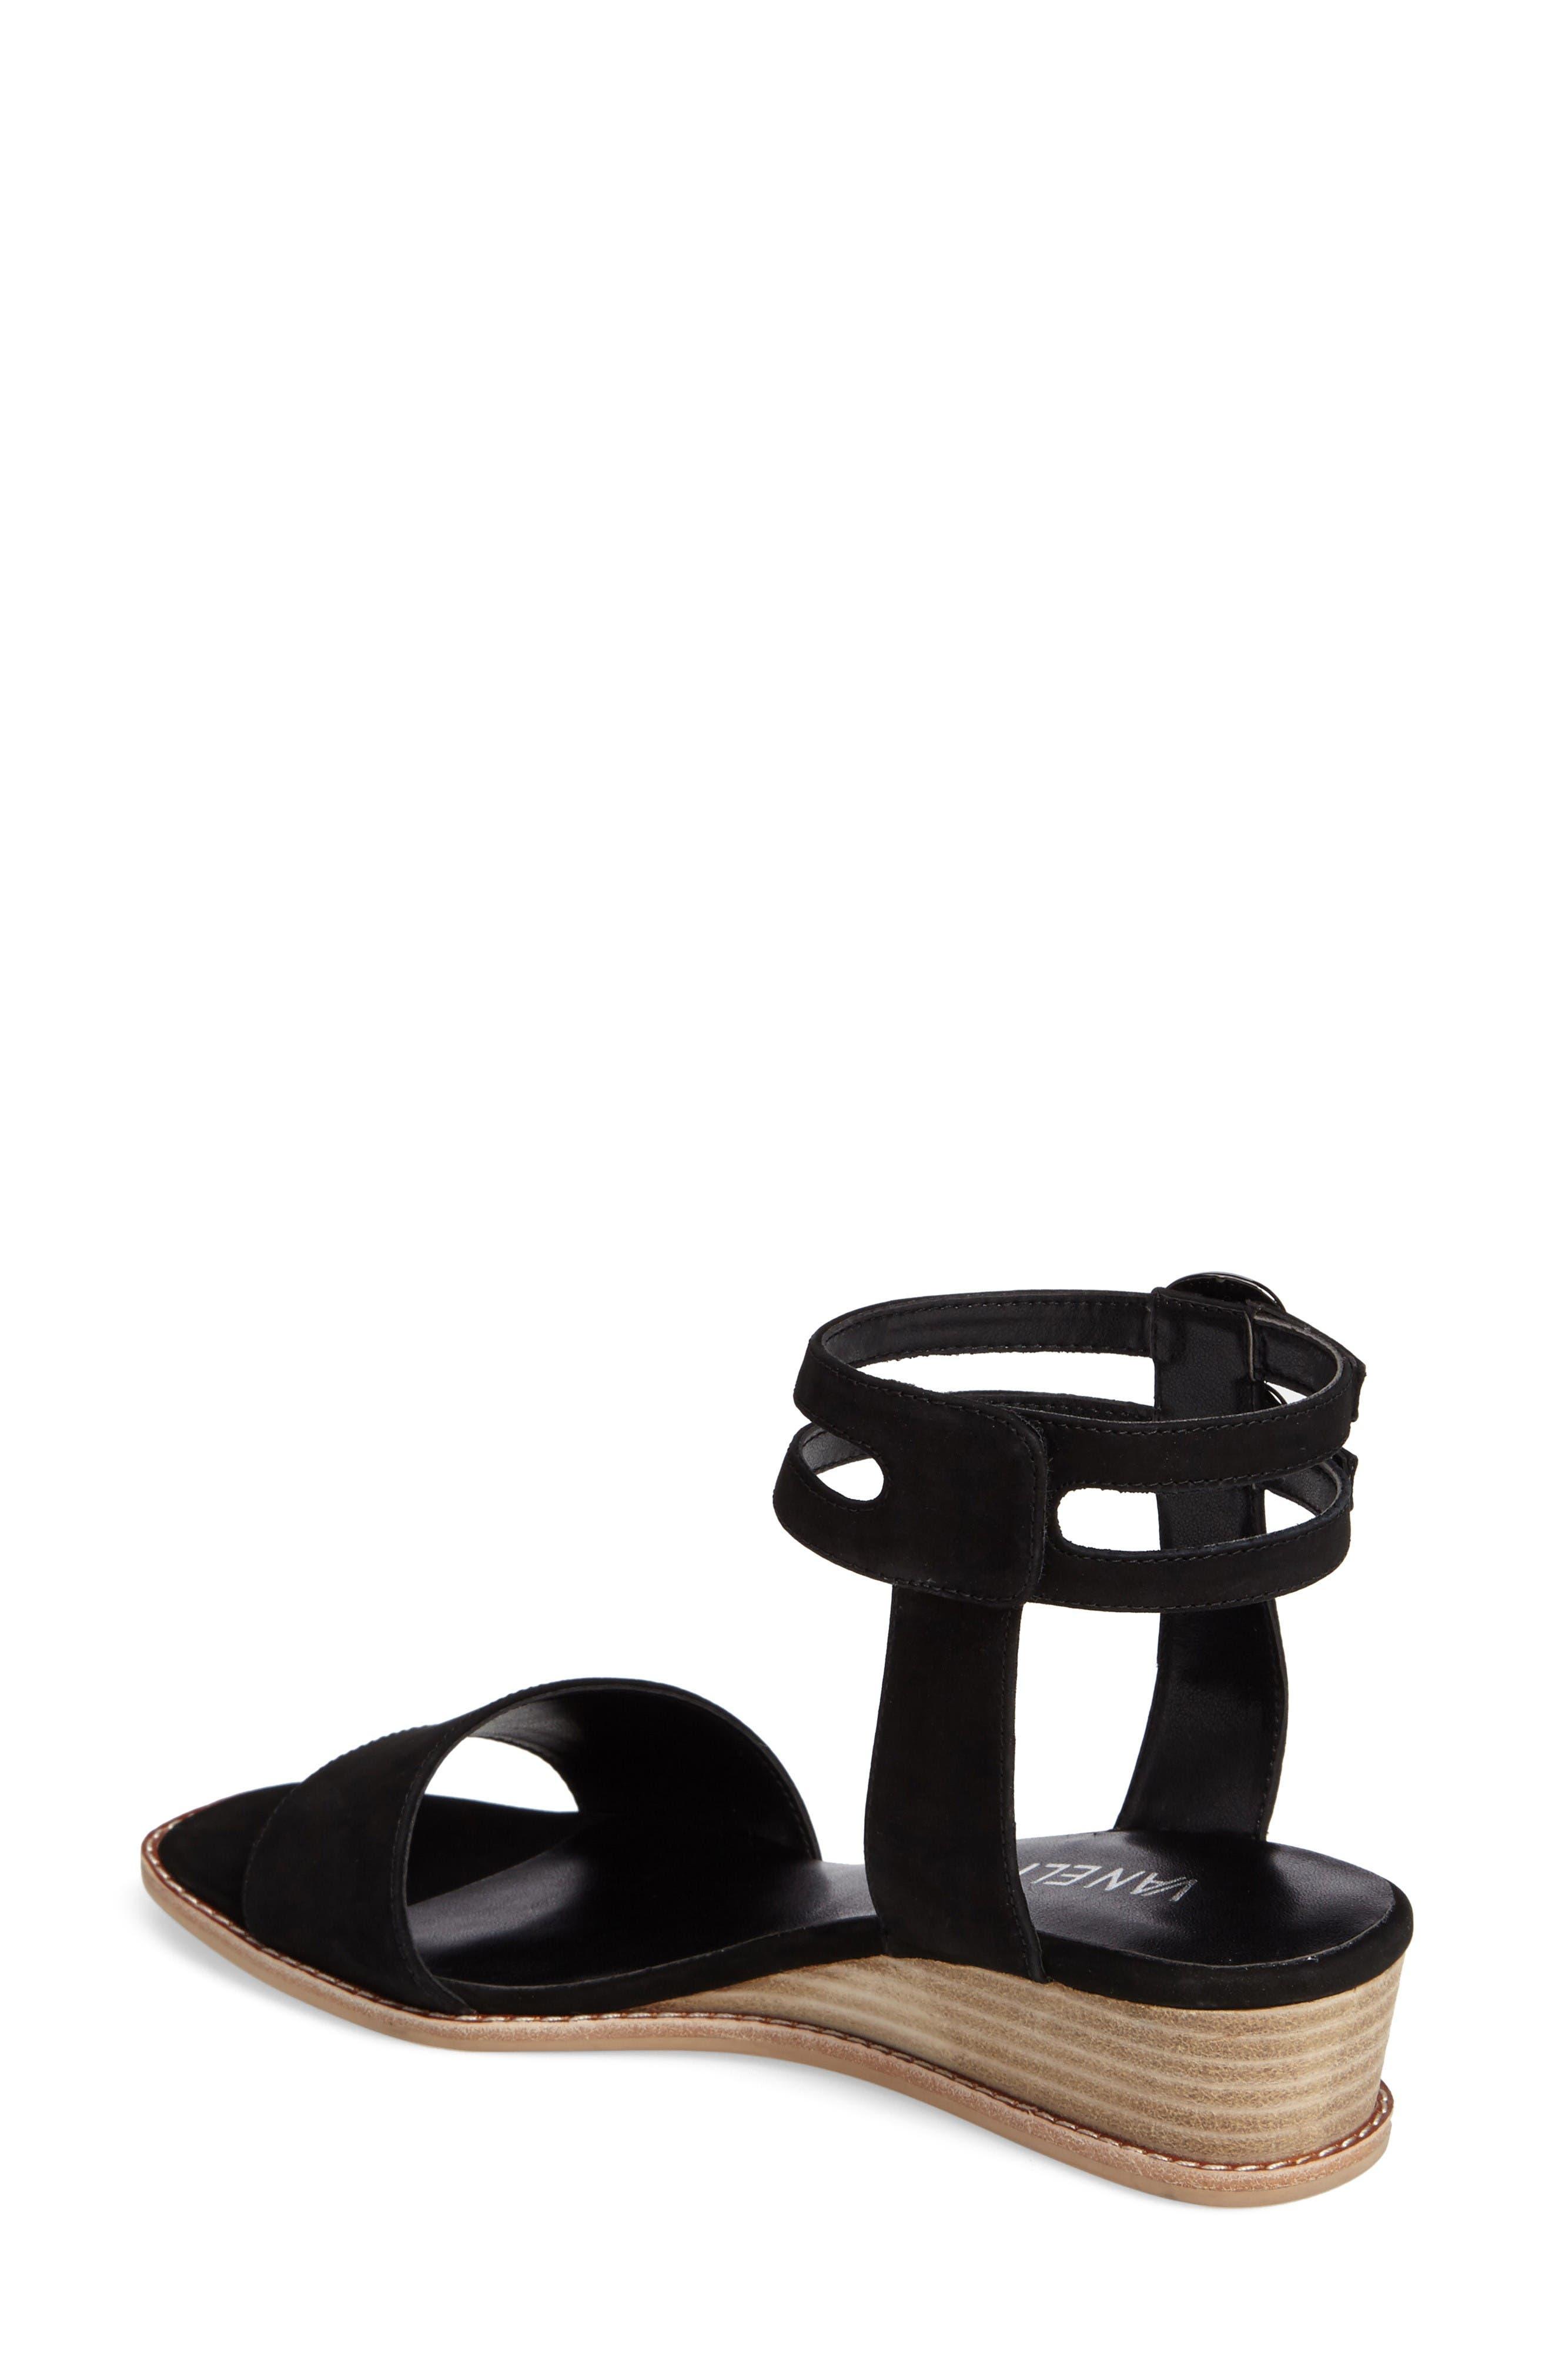 Jarita Ankle Strap Sandal,                             Alternate thumbnail 2, color,                             Black Leather